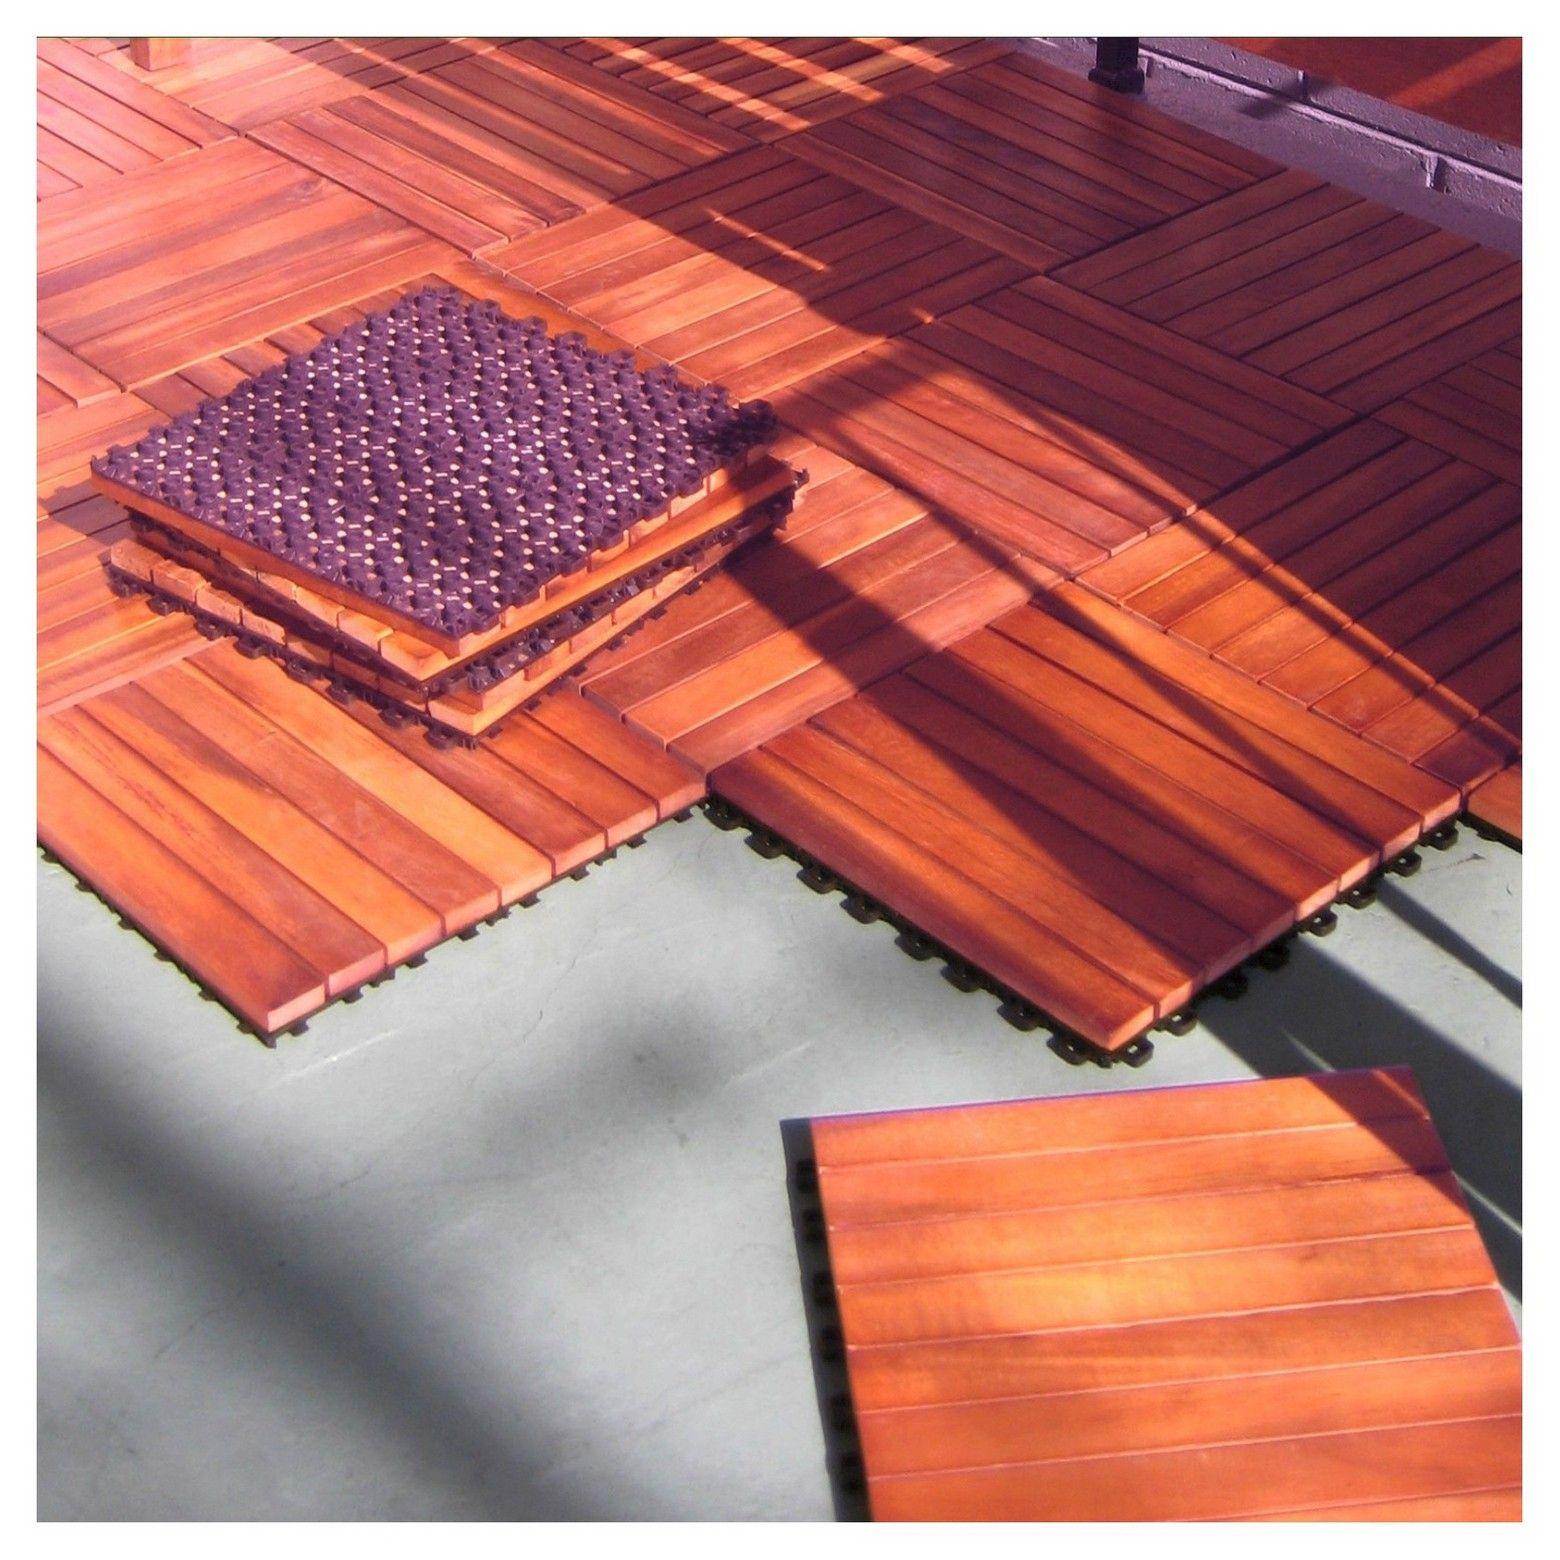 Vifah 8 Slat Eucalyptus Interlocking Deck Tile Brown Set Of 10 Deck Tile Wood Deck Tiles Interlocking Deck Tiles